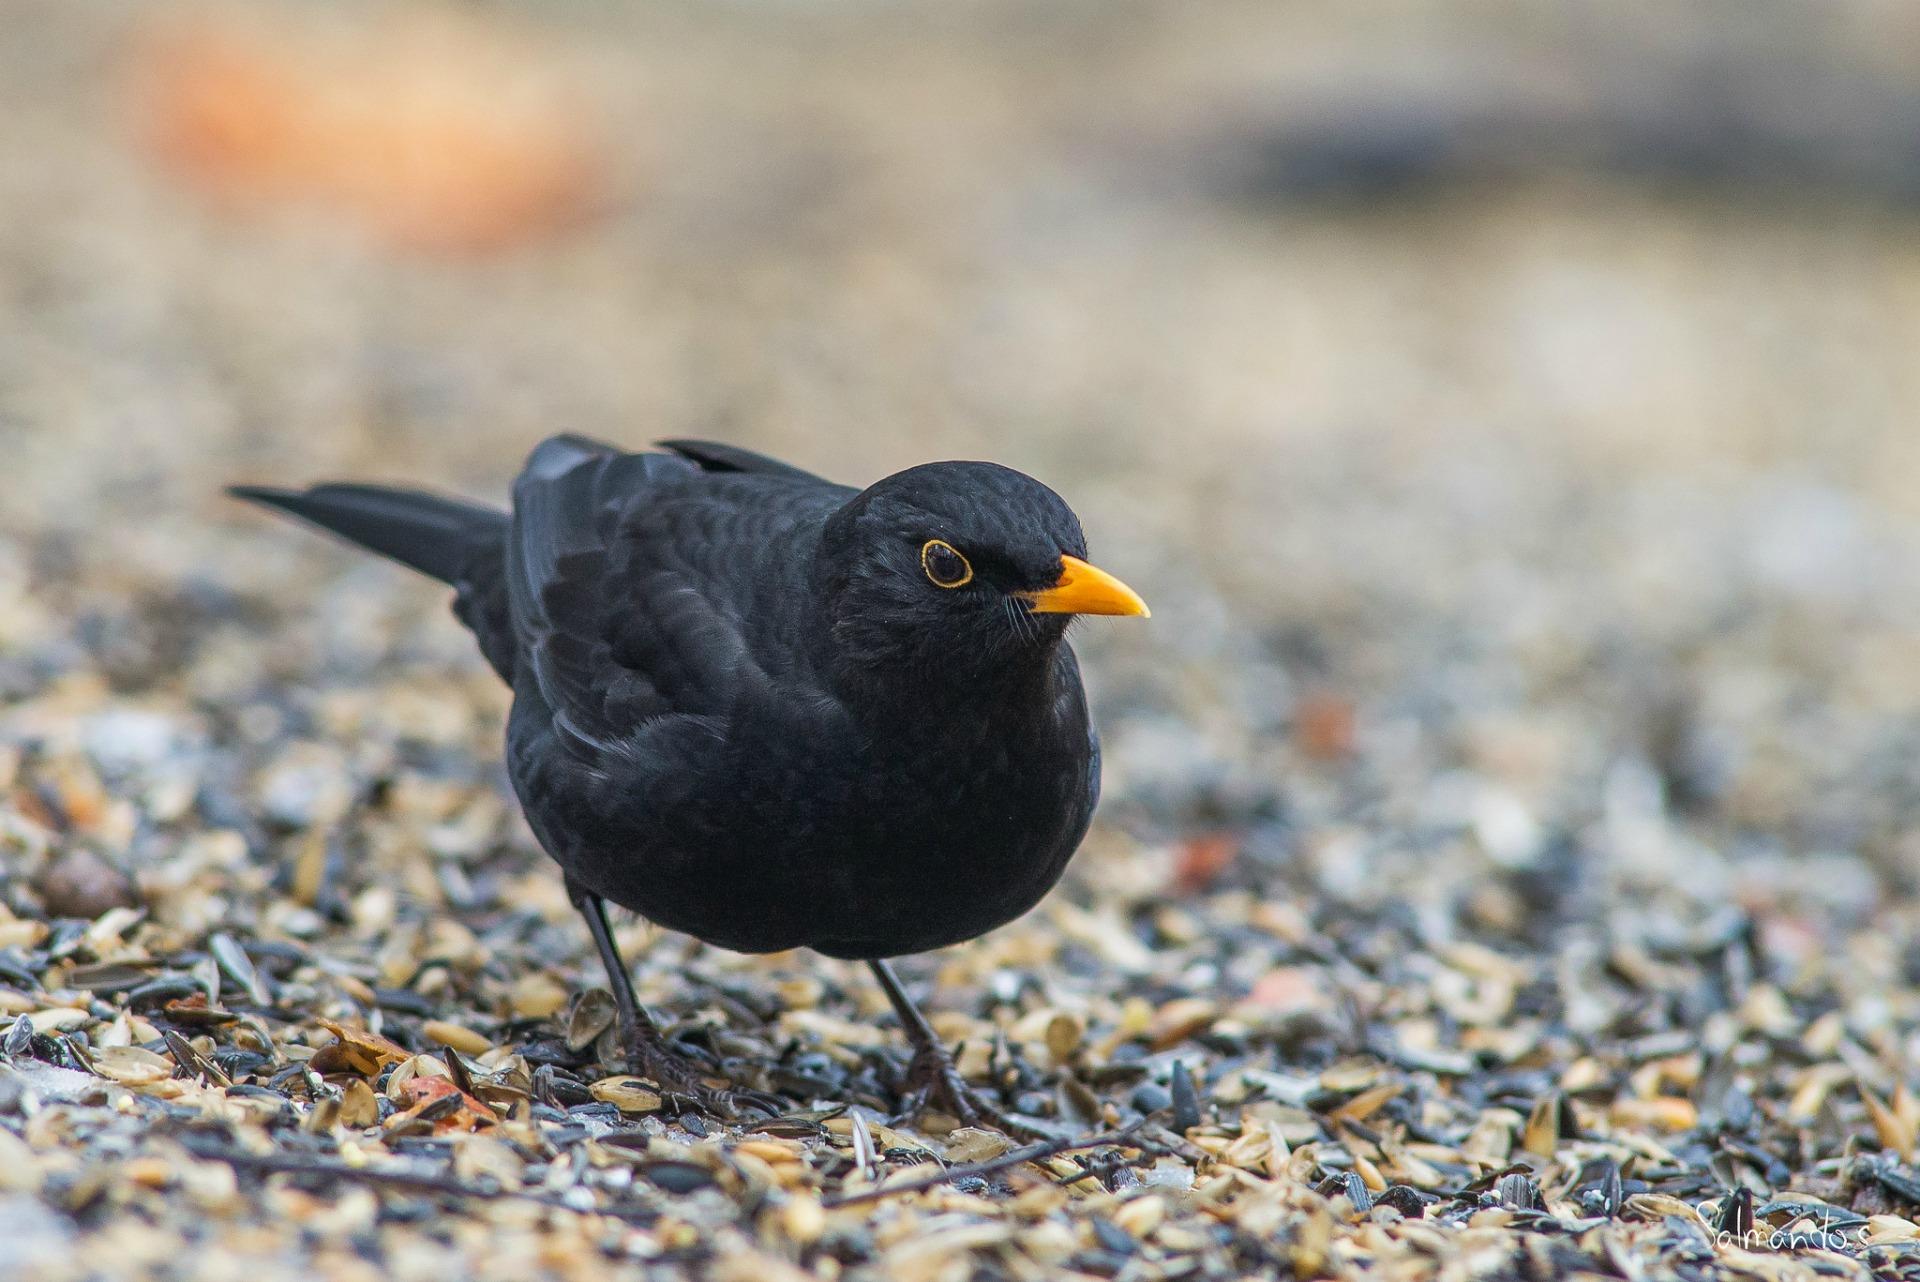 Should the blackbird be the UK's national bird?